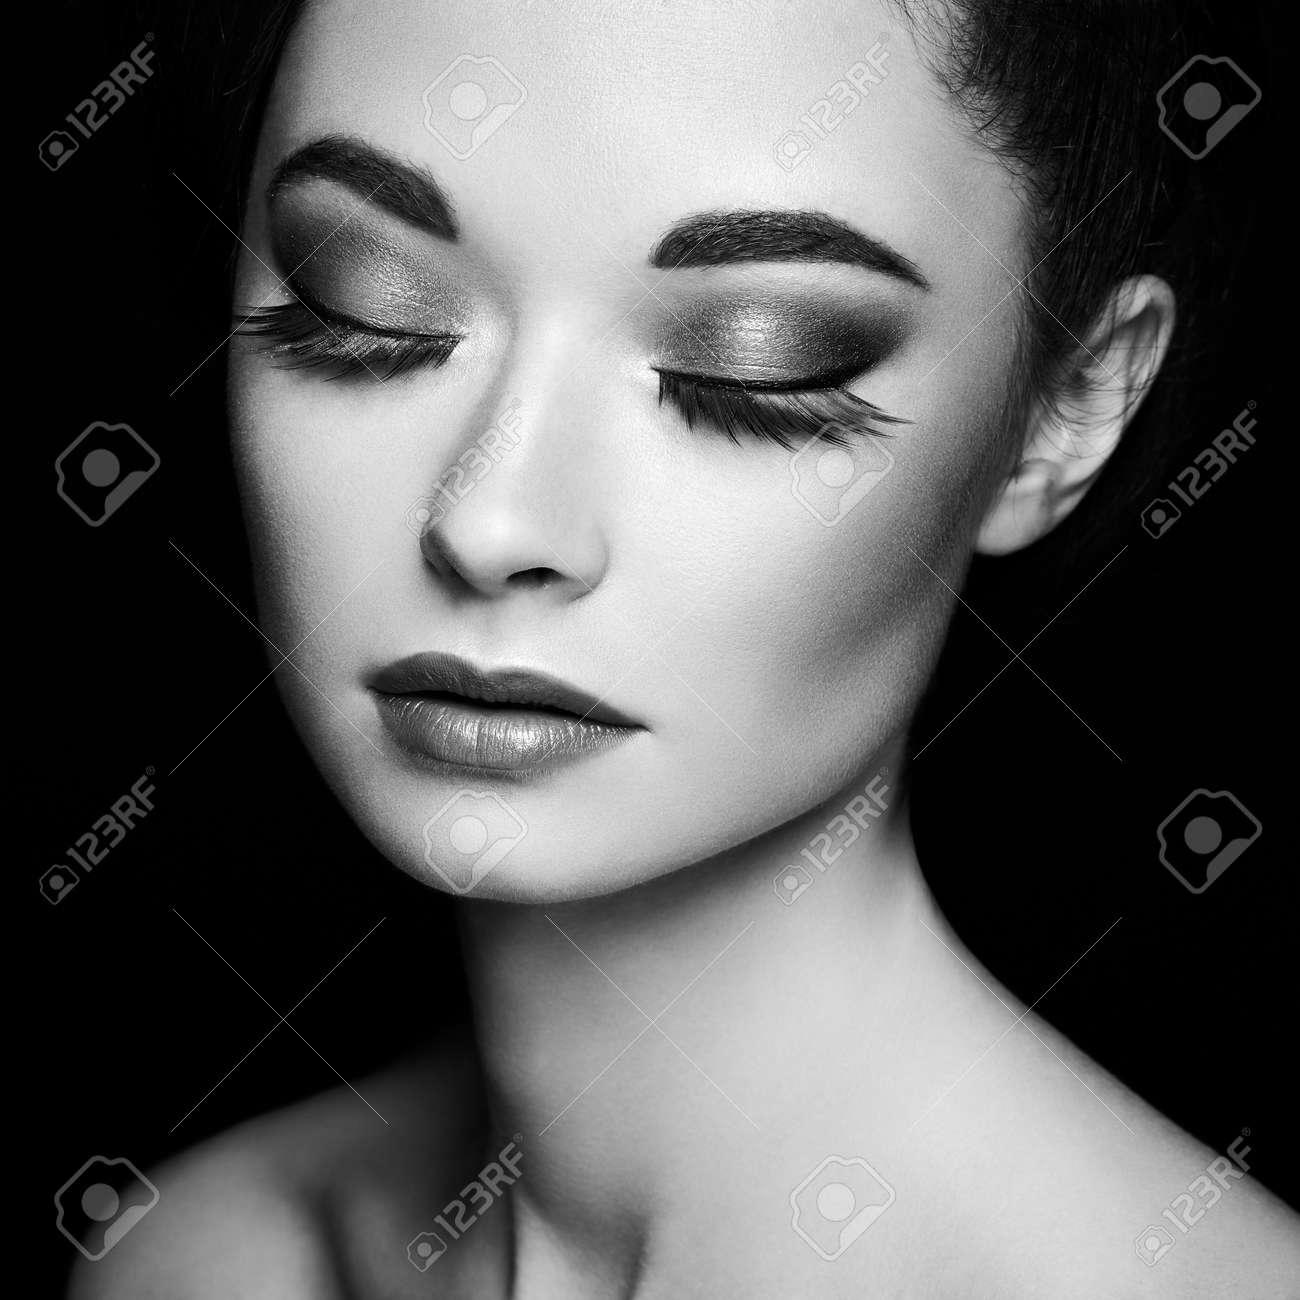 Beautiful woman face. Perfect makeup. Beauty fashion. Eyelashes. Cosmetic Eyeshadow. Black and white photo. - 150330650